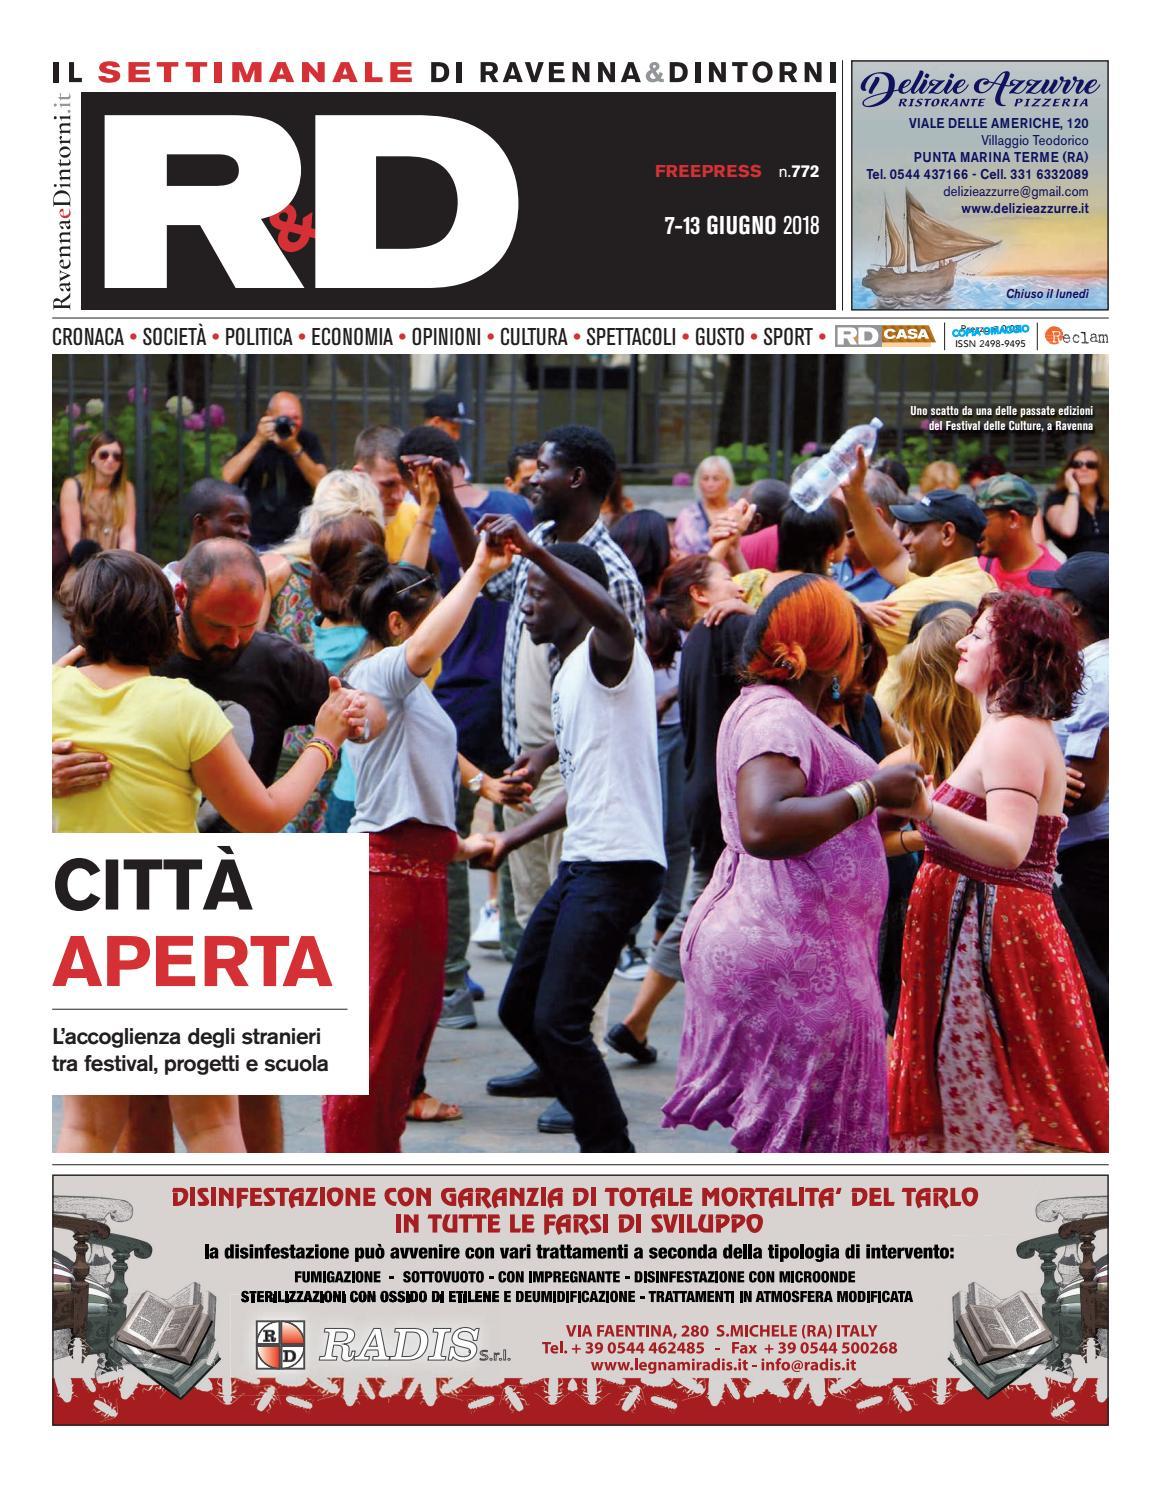 Rd 07 06 18 by Reclam Edizioni e Comunicazione - issuu